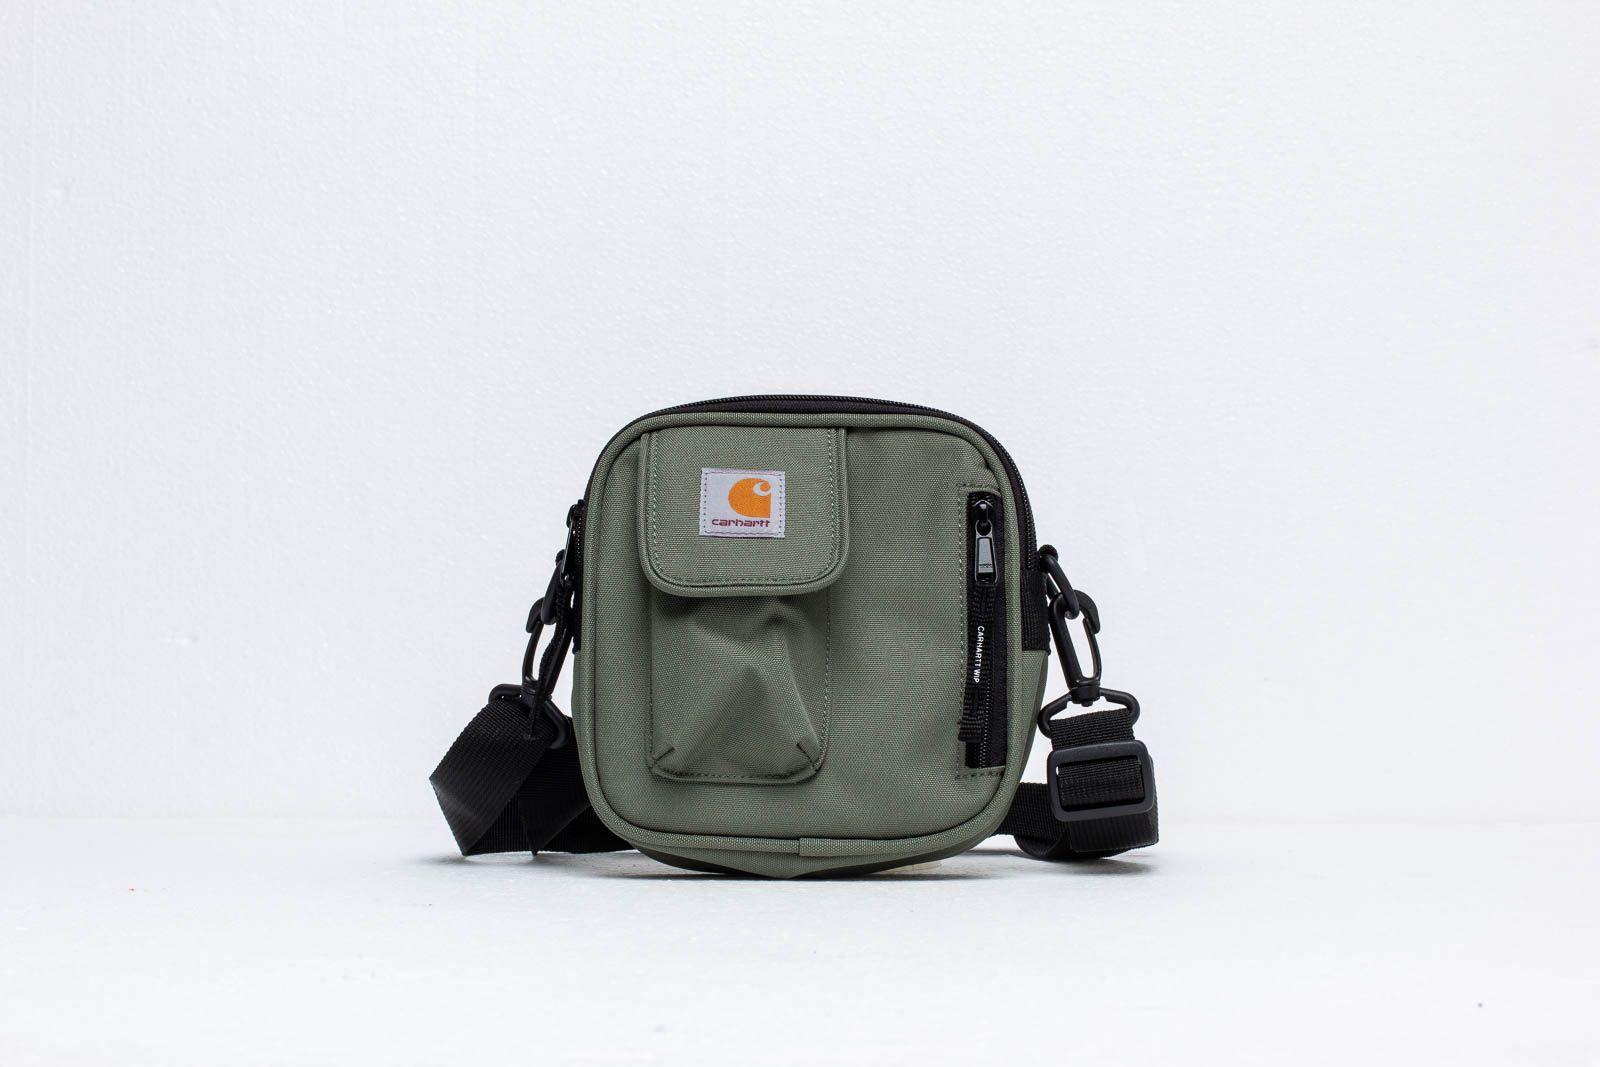 Carhartt WIP Small Essentials Bag